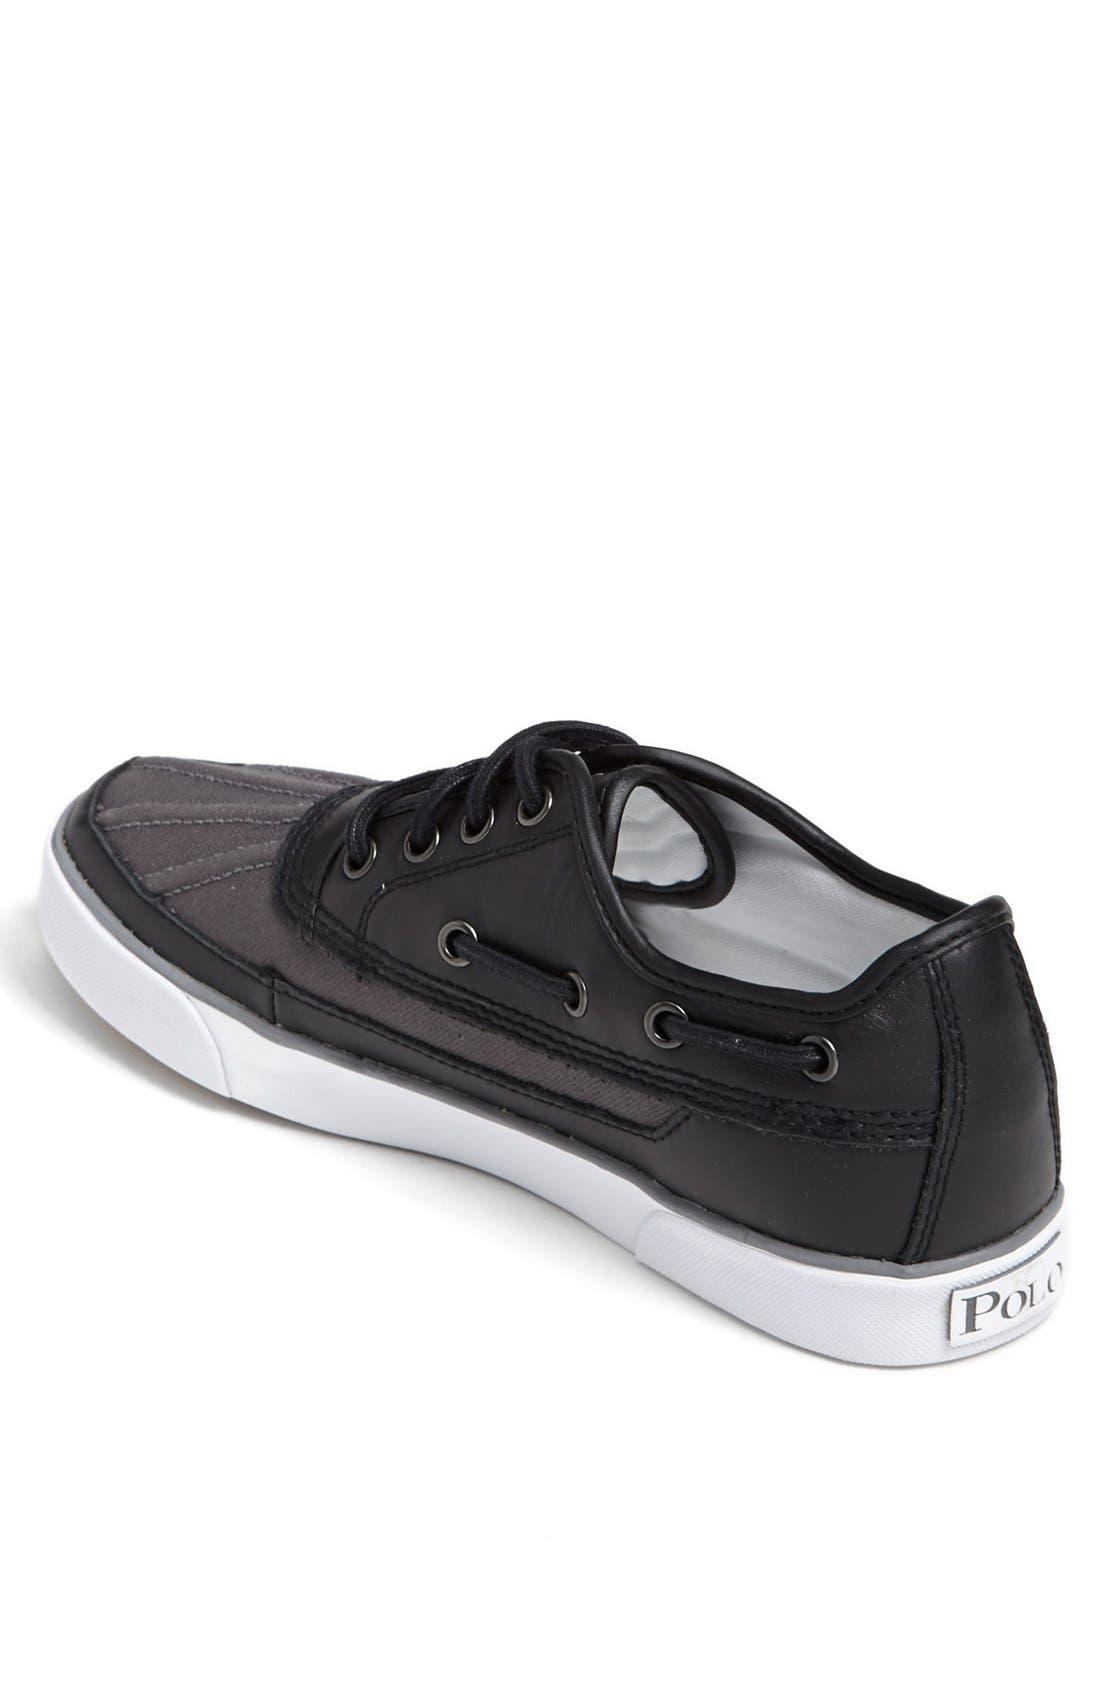 Alternate Image 2  - Polo Ralph Lauren 'Parkstone' Sneaker